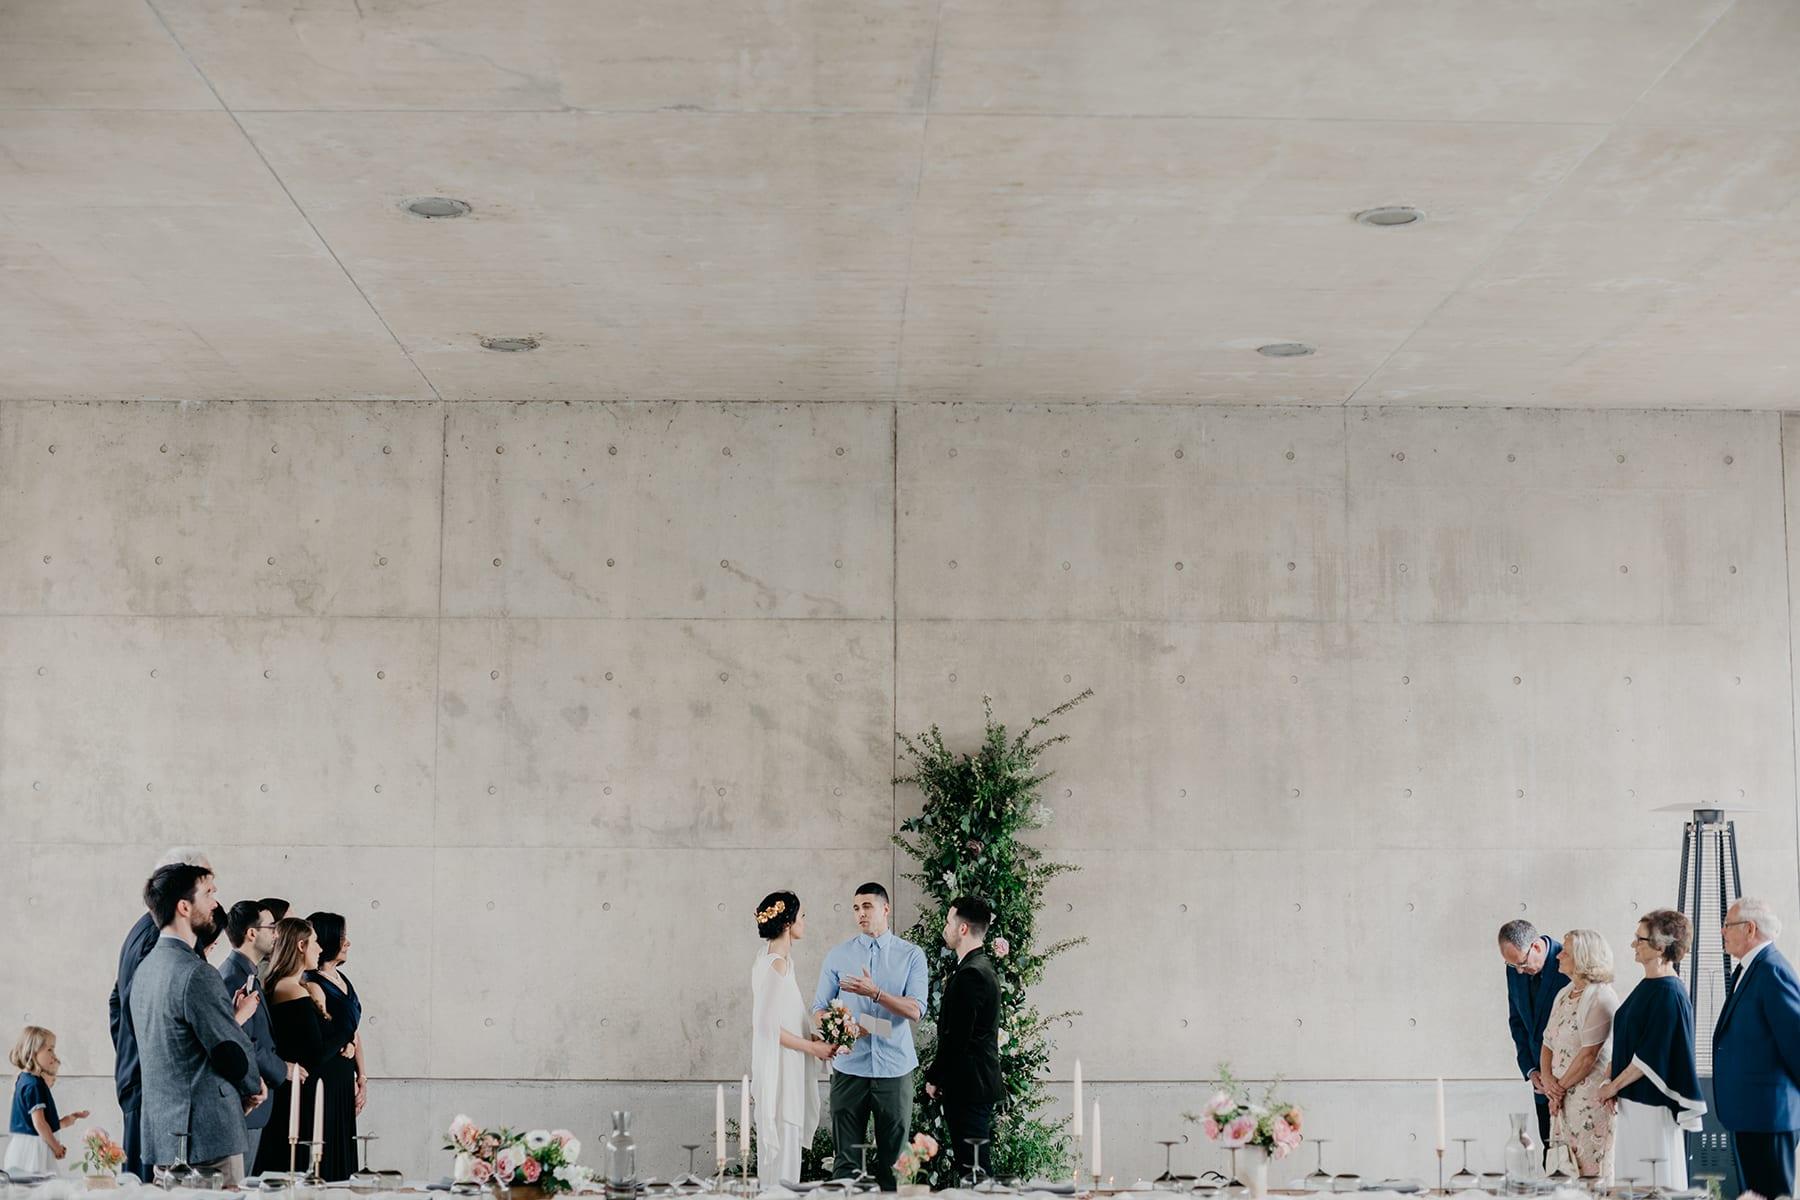 tylerkendra-wedding04.jpg